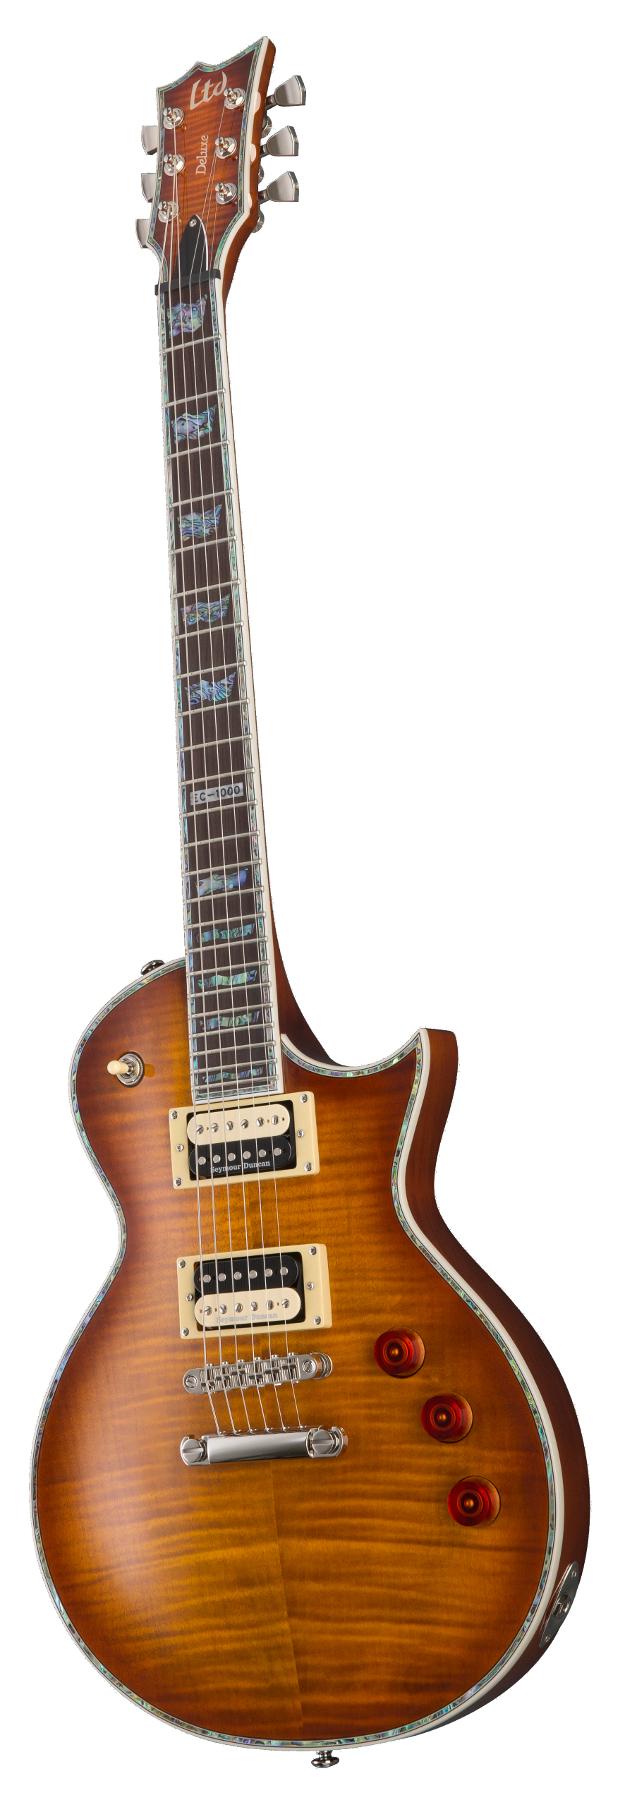 Electric Guitar, Amber Sunburst